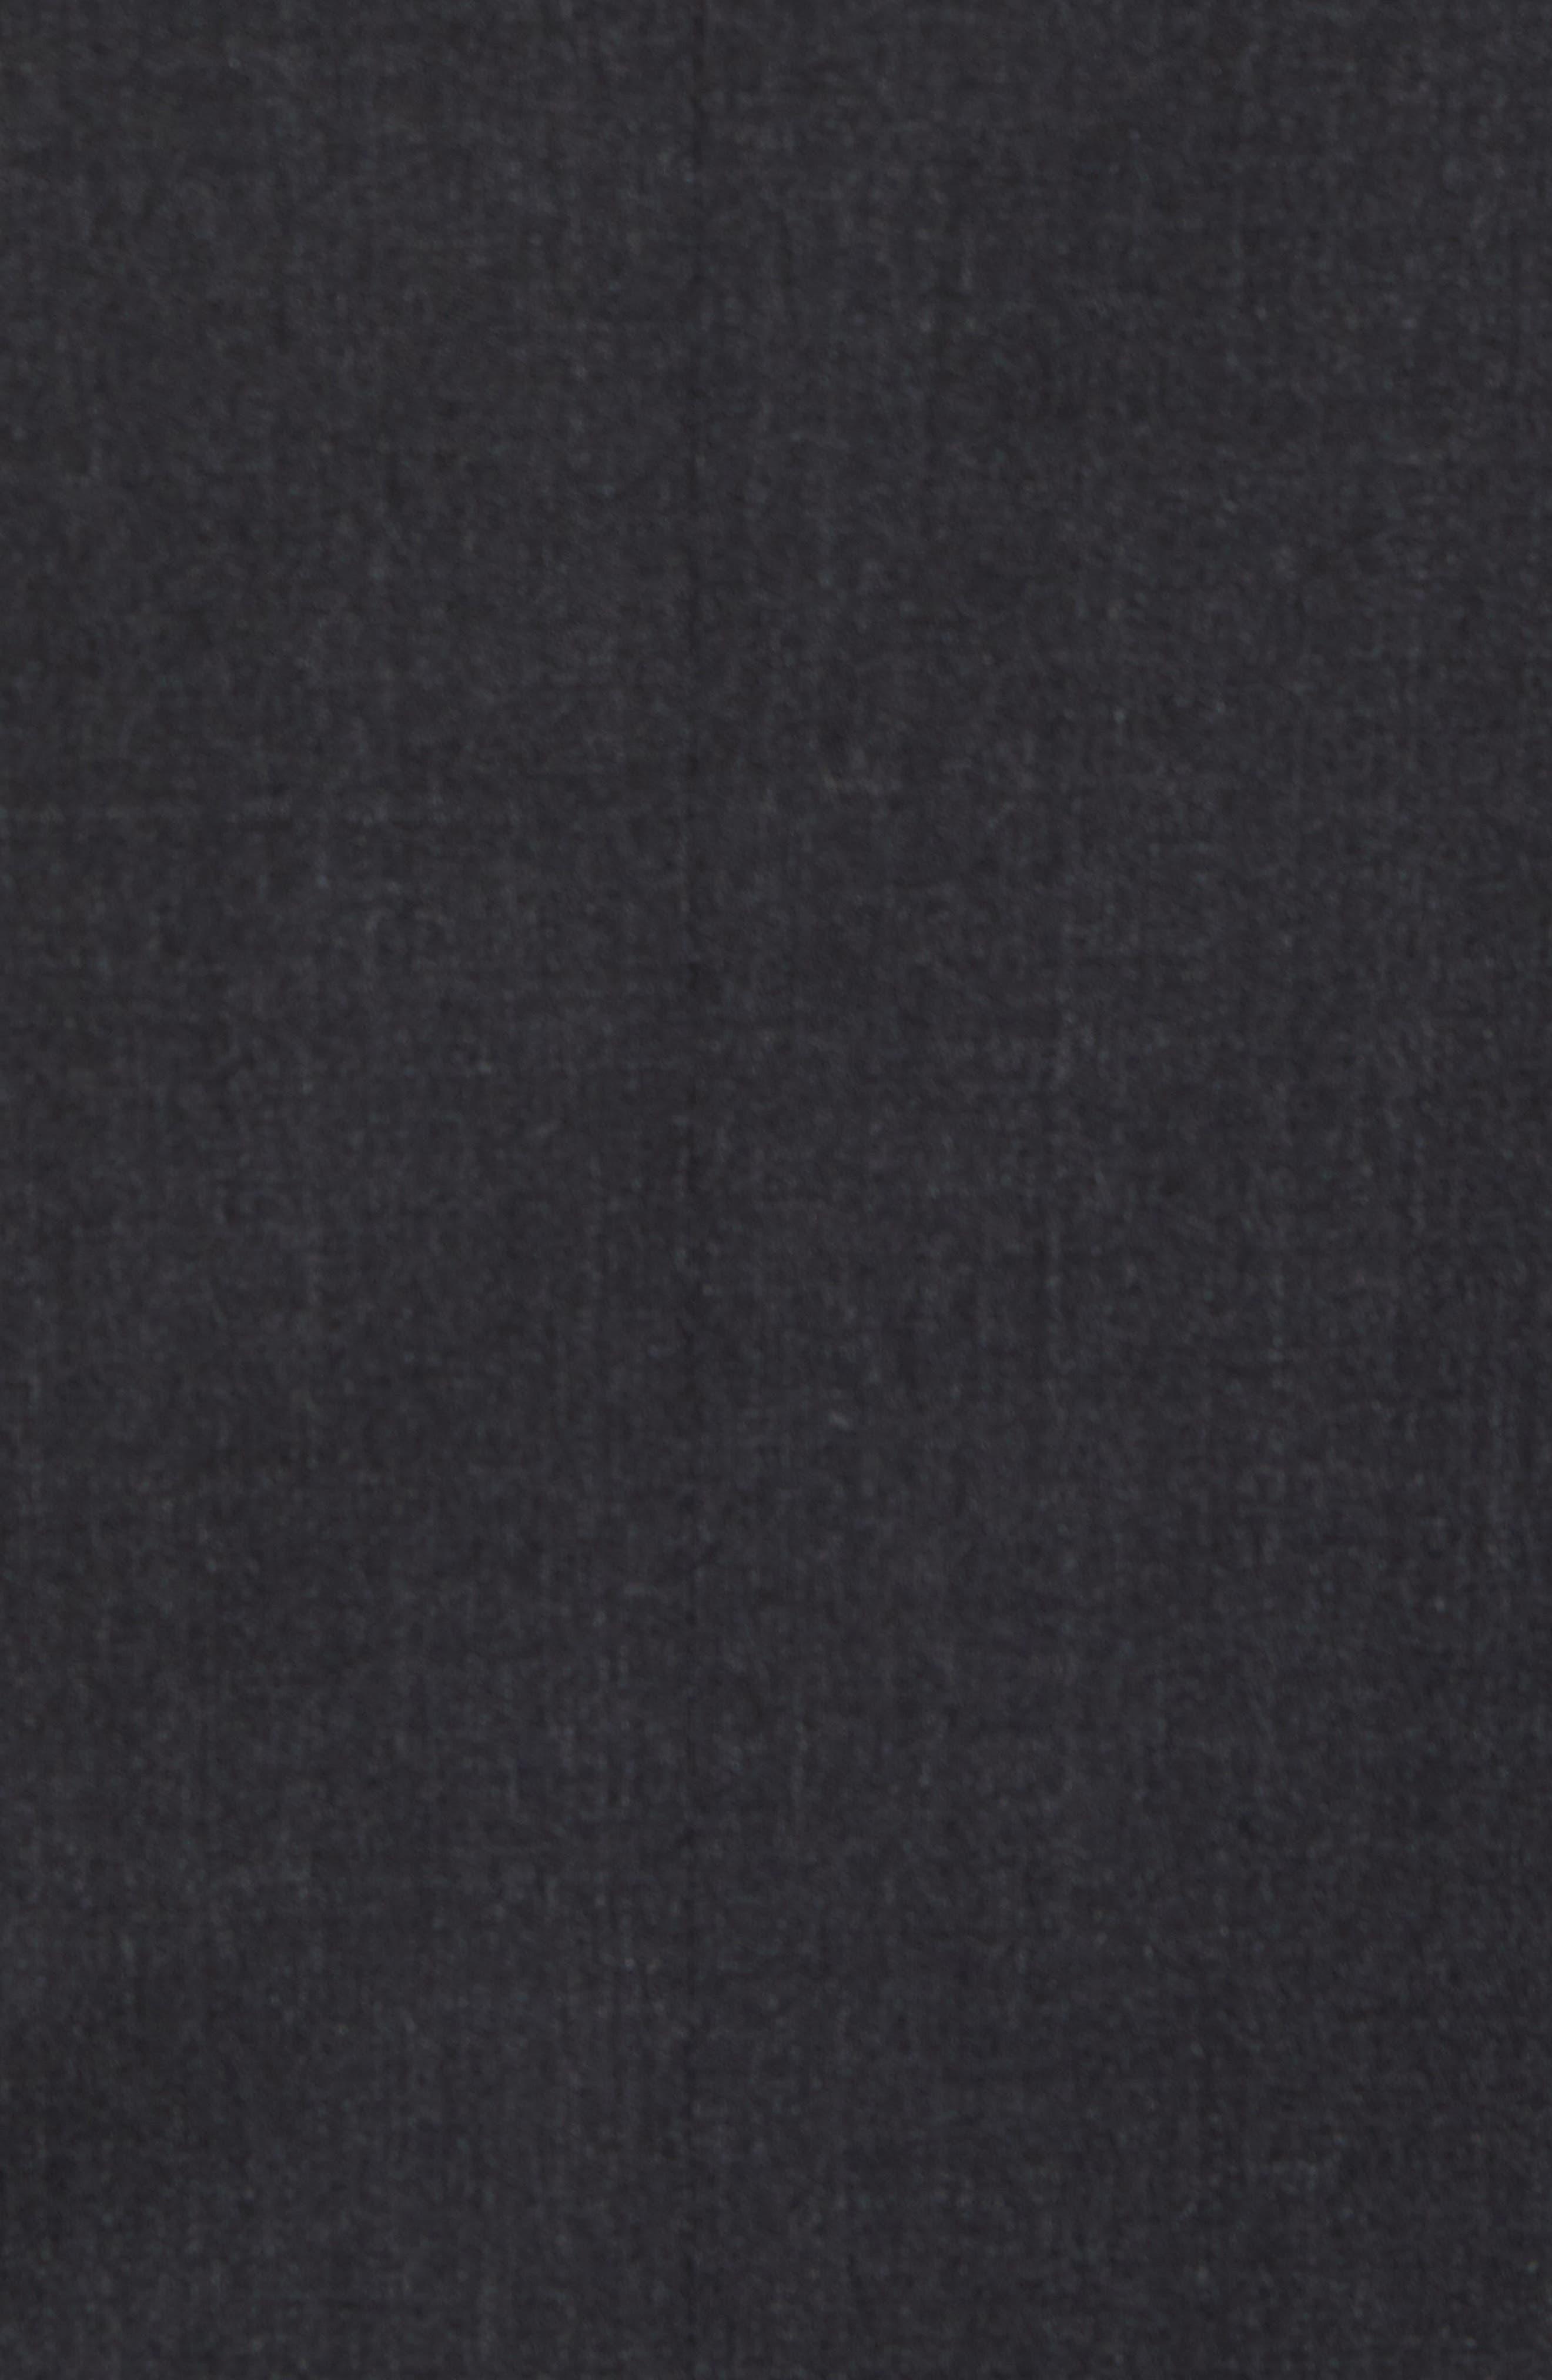 BONOBOS, Jetsetter Slim Fit Stretch Wool Blazer, Alternate thumbnail 7, color, CHARCOAL